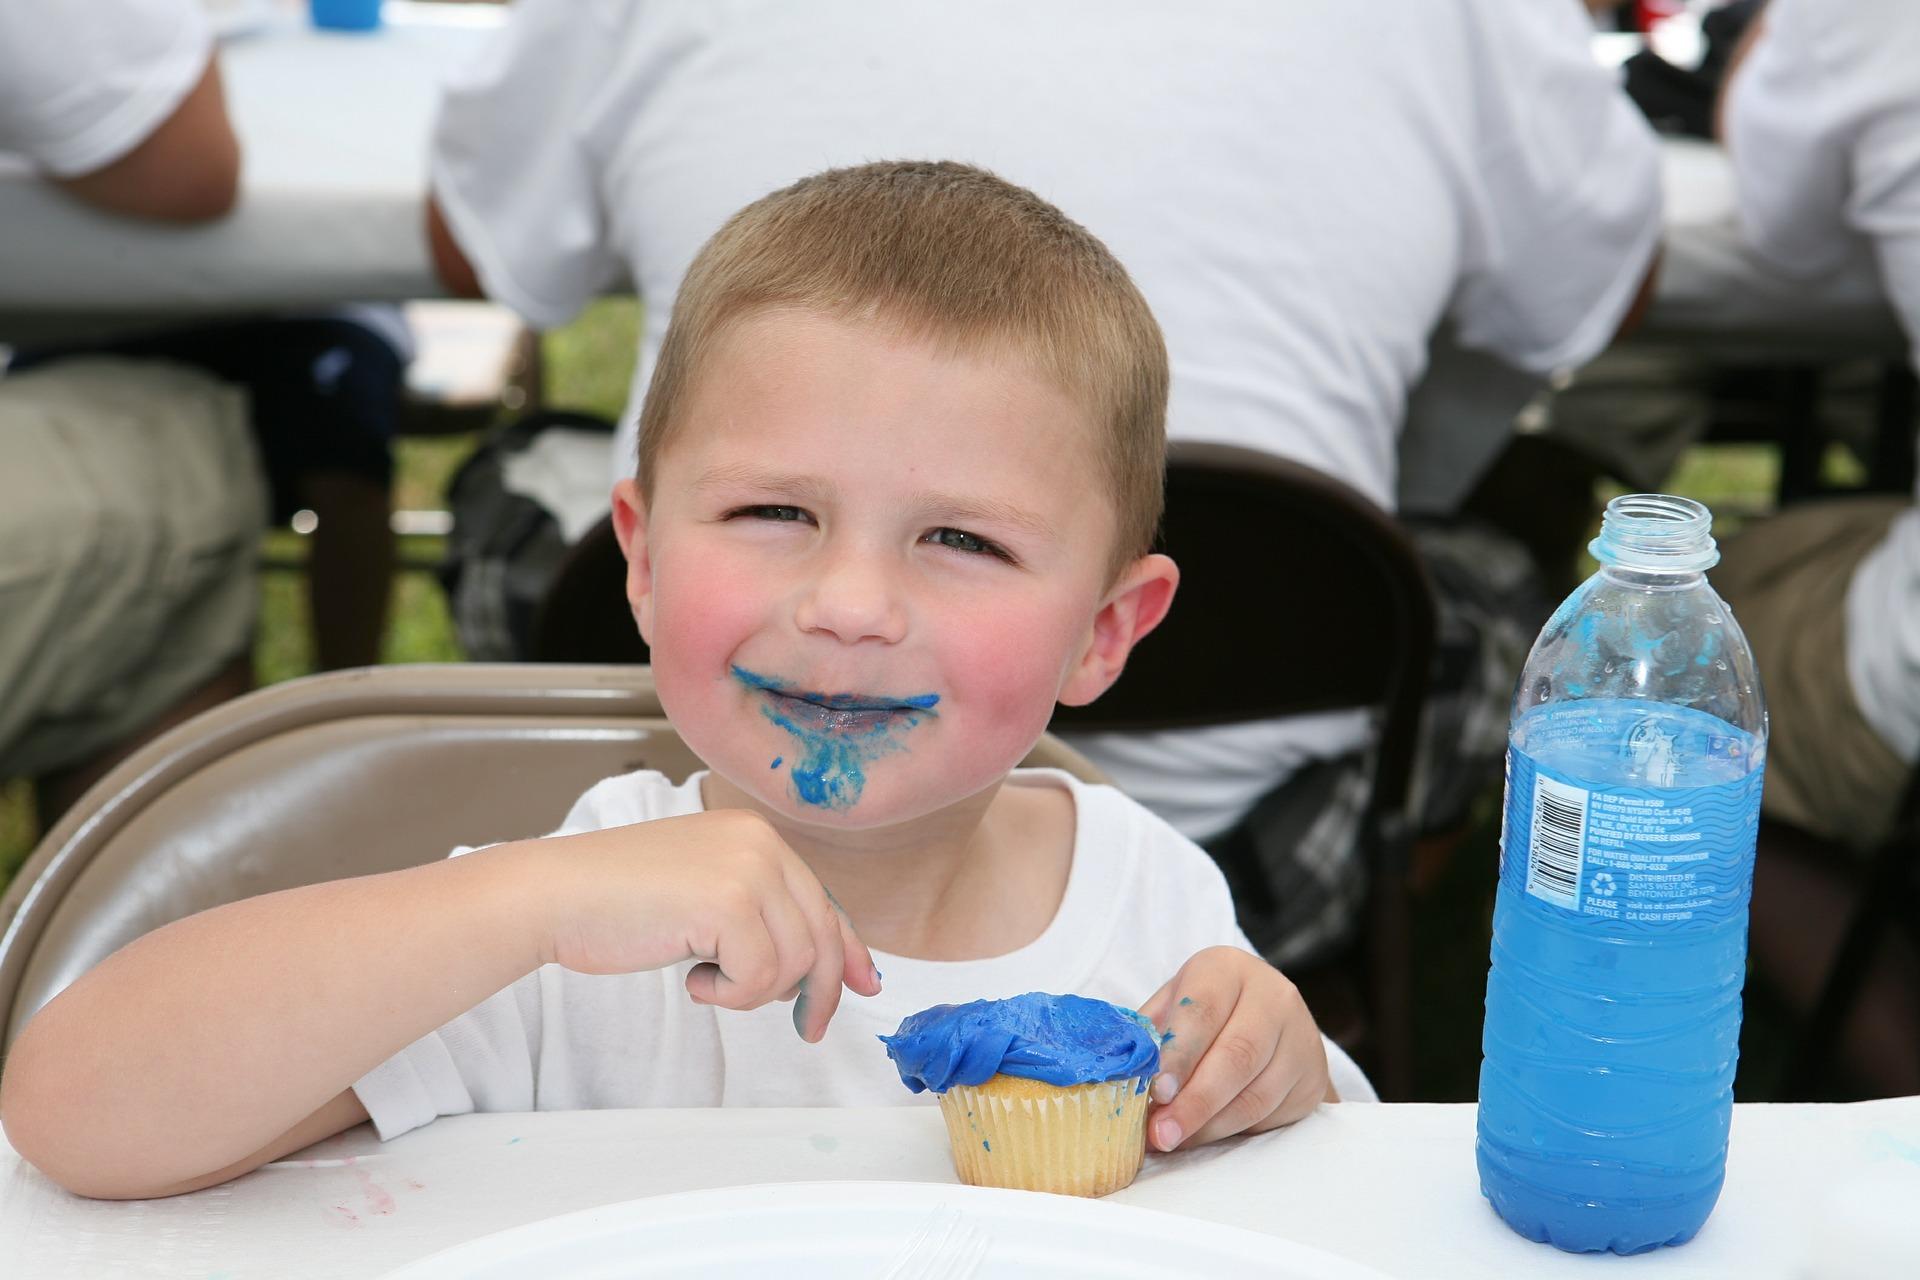 Boy Eating Cupcake | Kids Car Donations